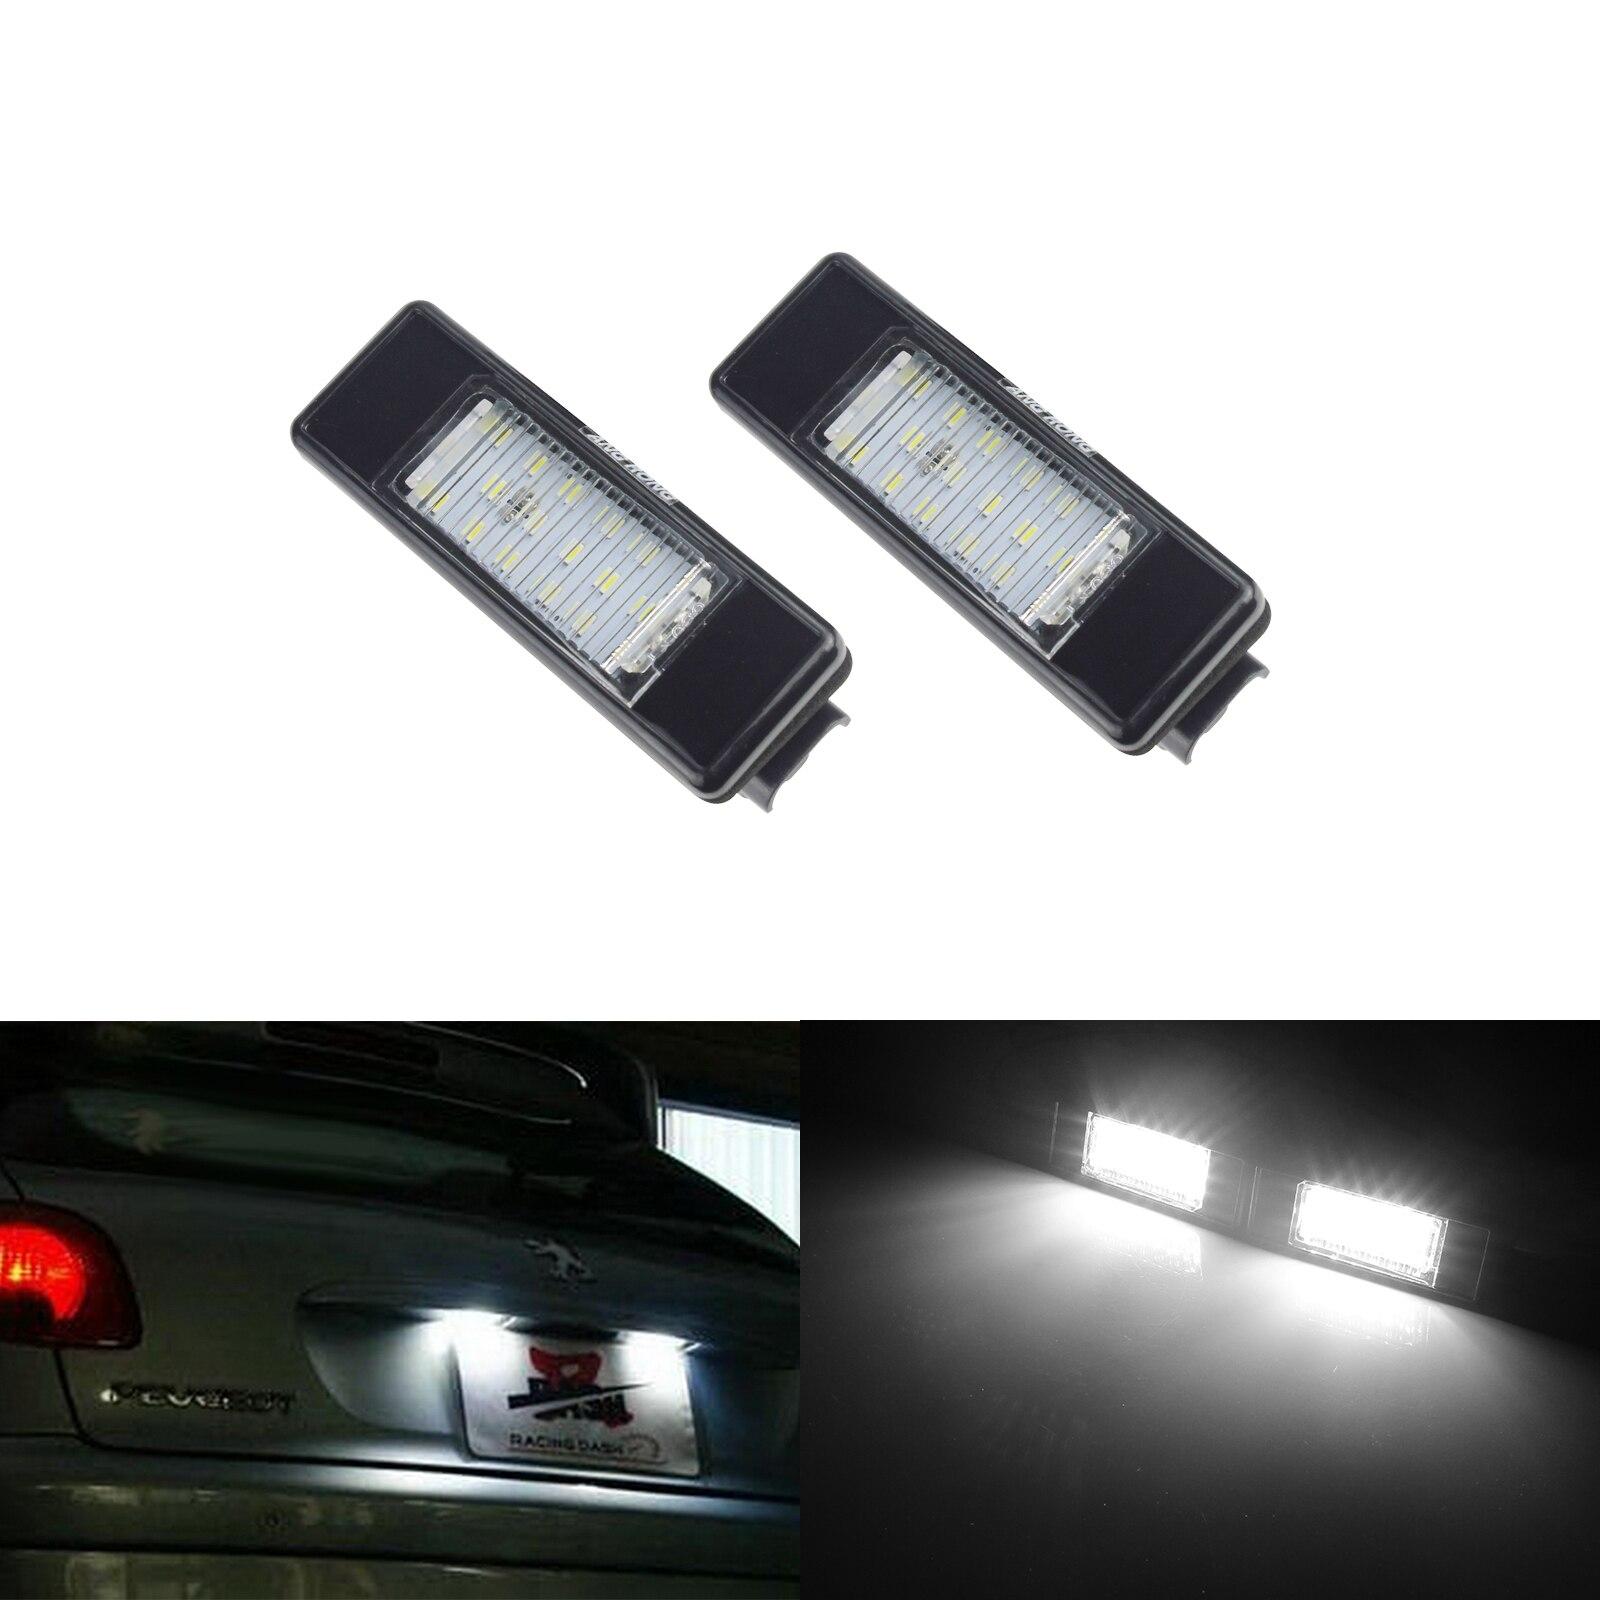 2x Citroen C2 Bright Xenon White LED Number Plate Upgrade Light Bulbs